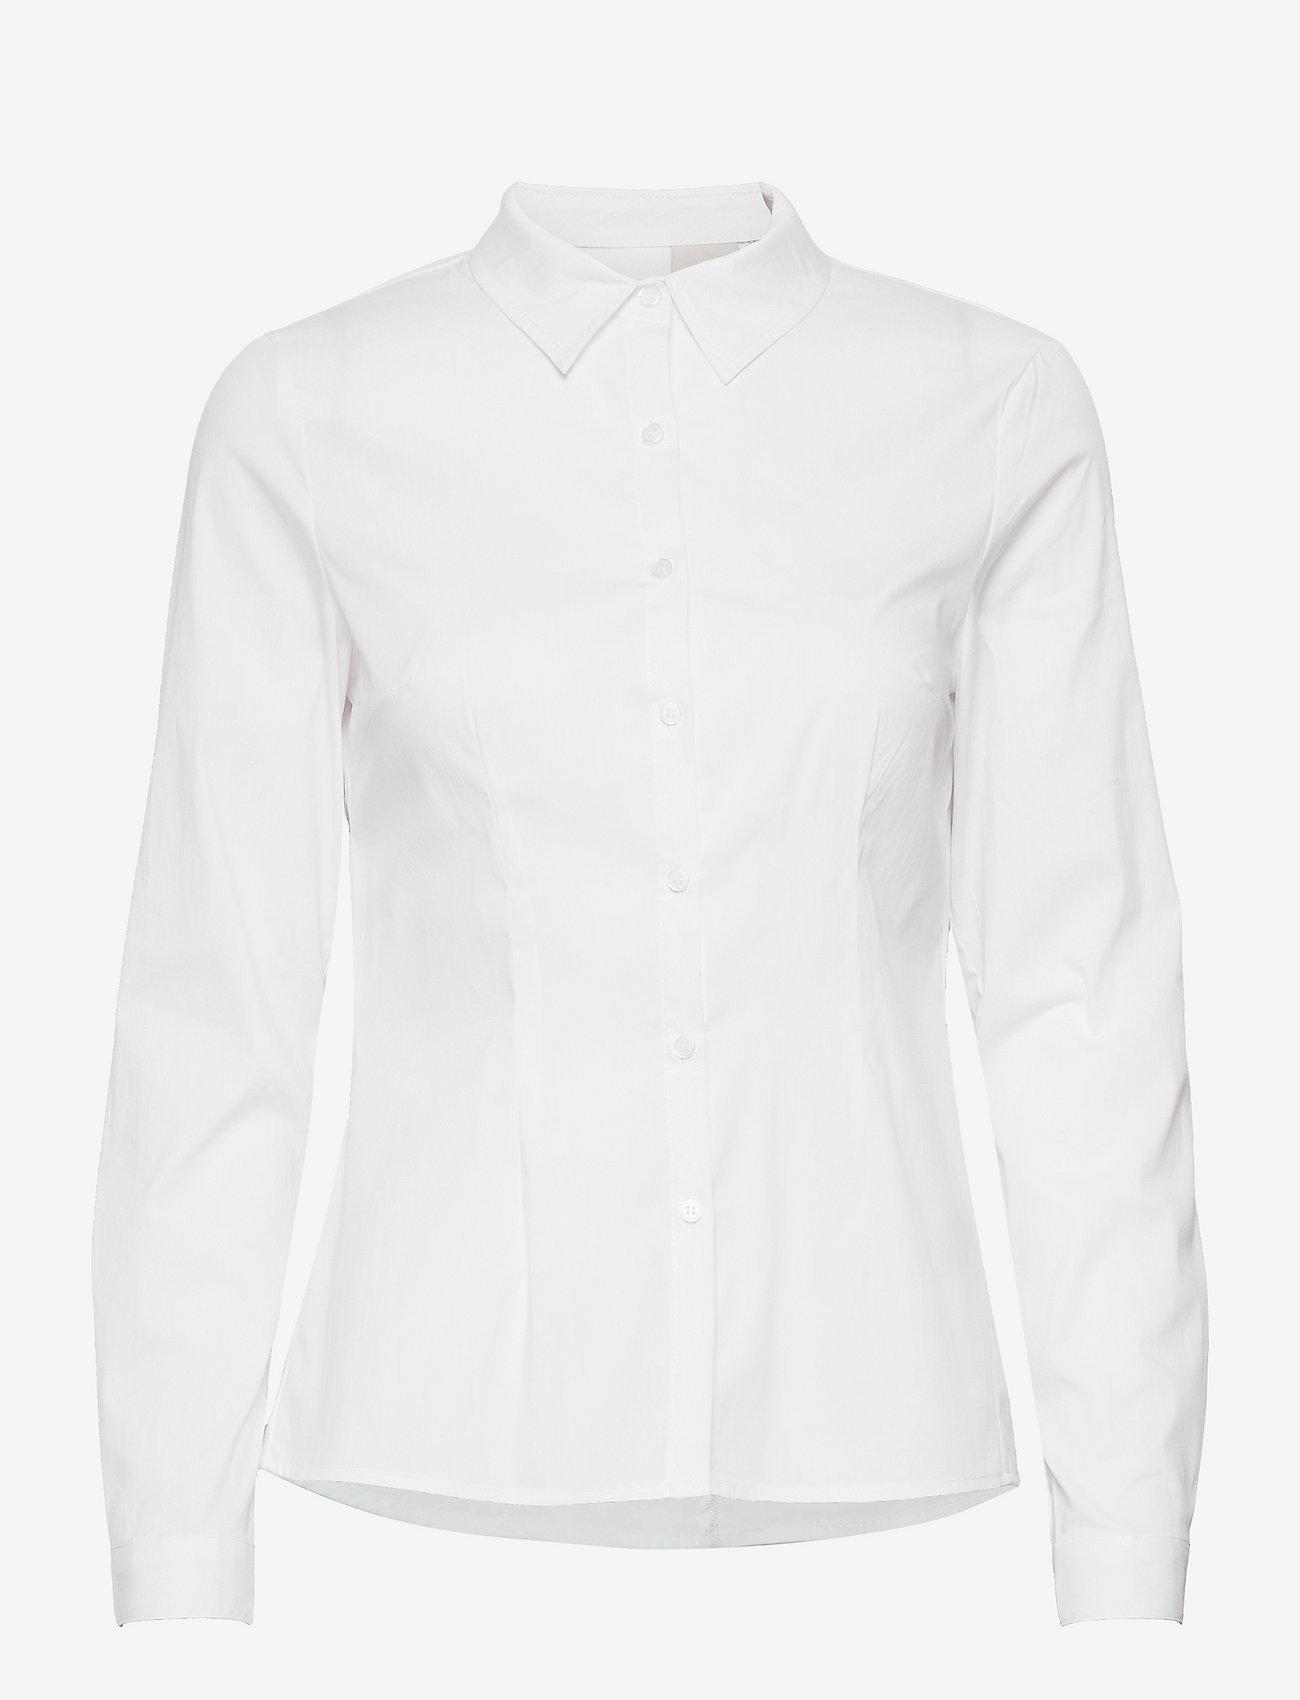 ICHI - IHDIMA SH - long-sleeved shirts - white - 0